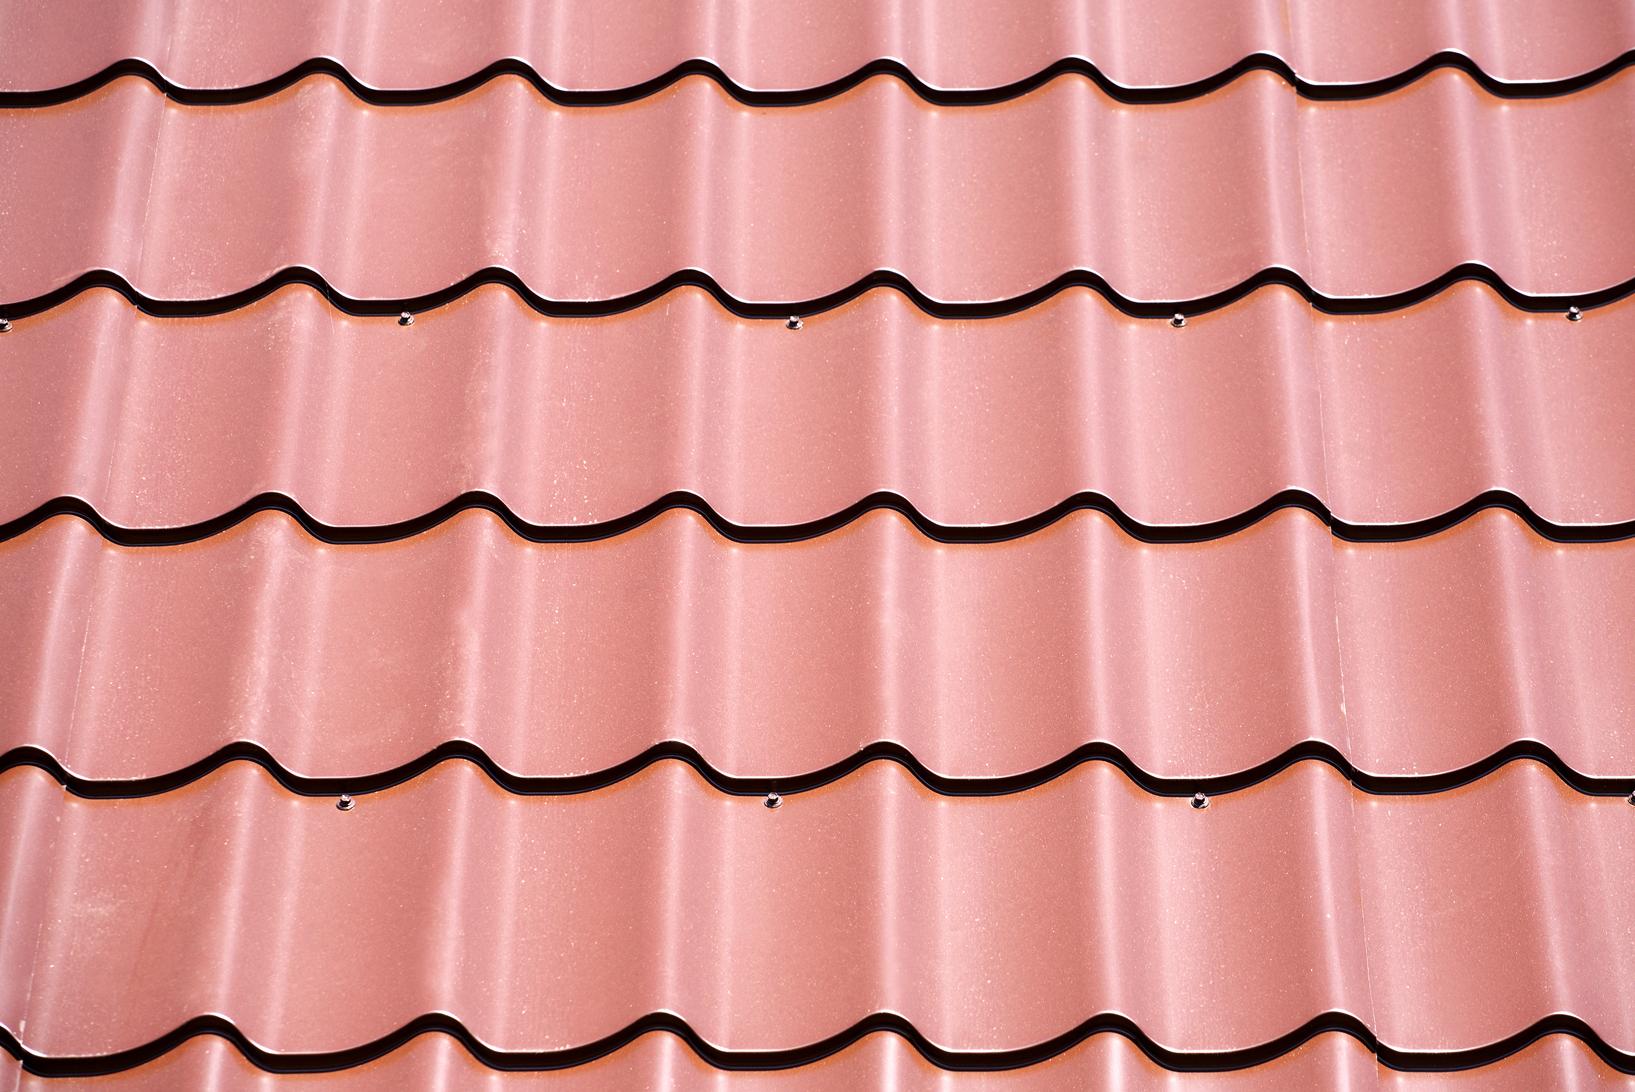 Metal Roofing Company Greensboro, NC